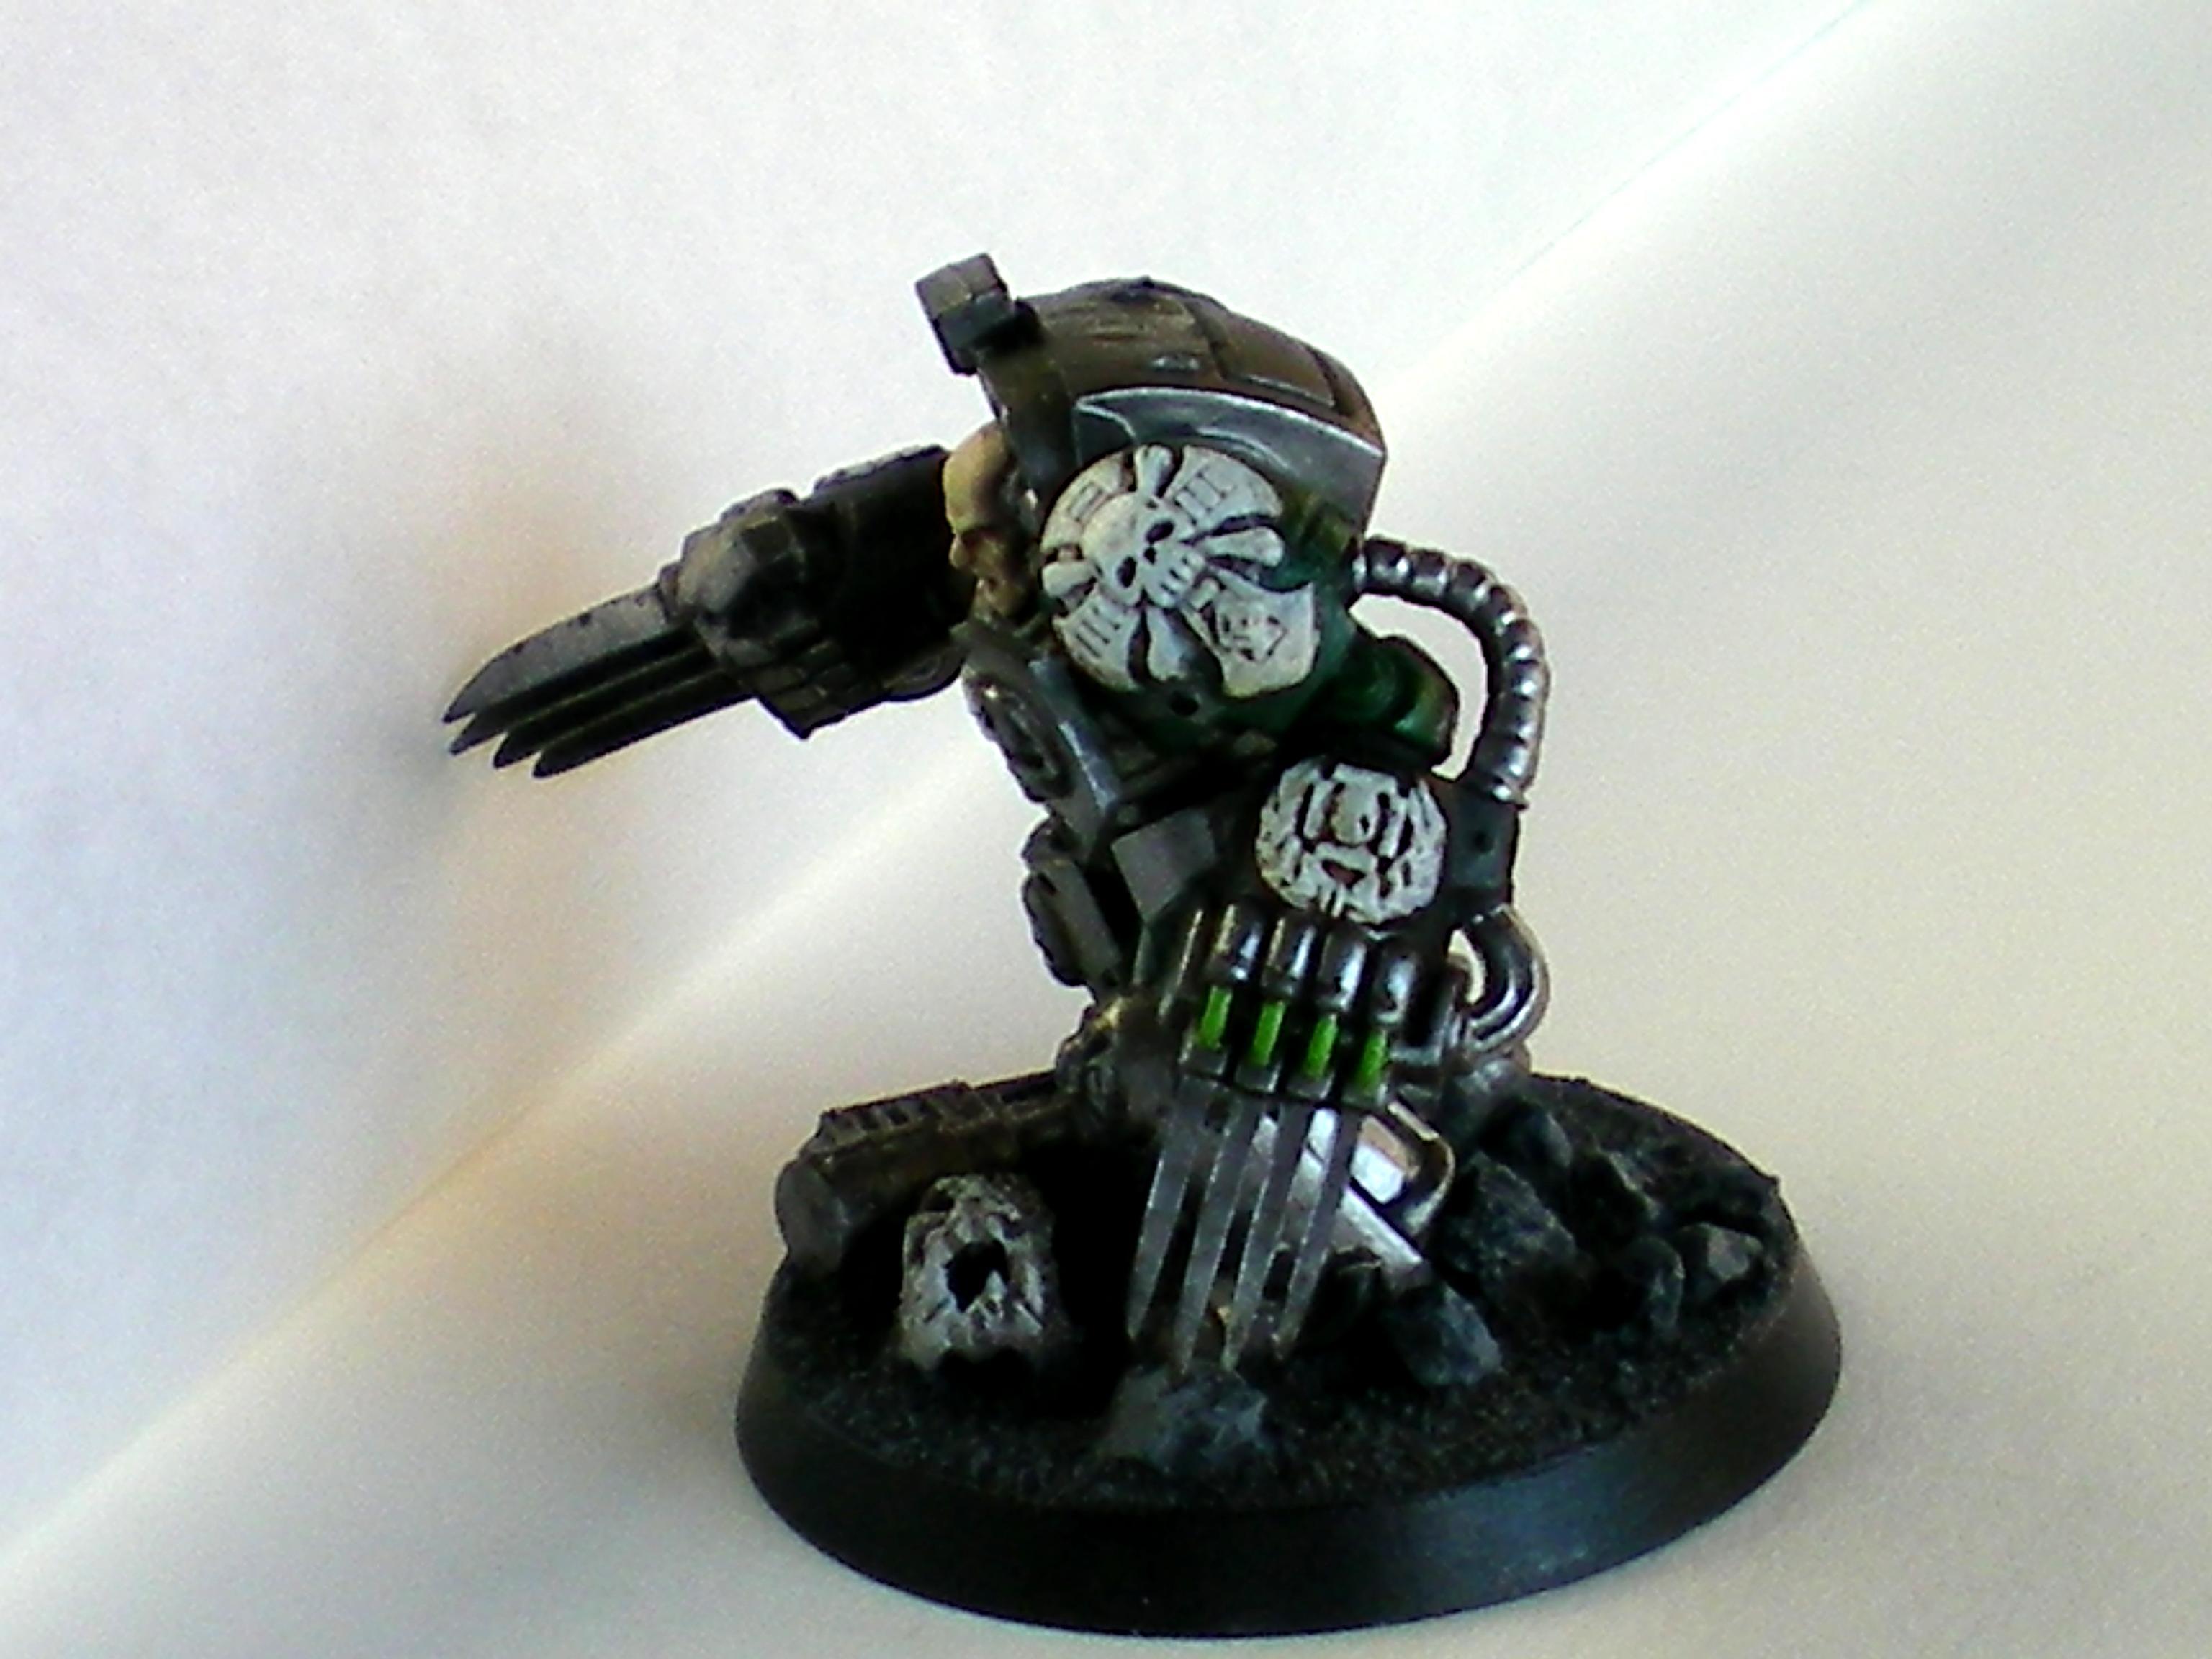 Space Marines, Terminator Armor, Warhammer 40,000